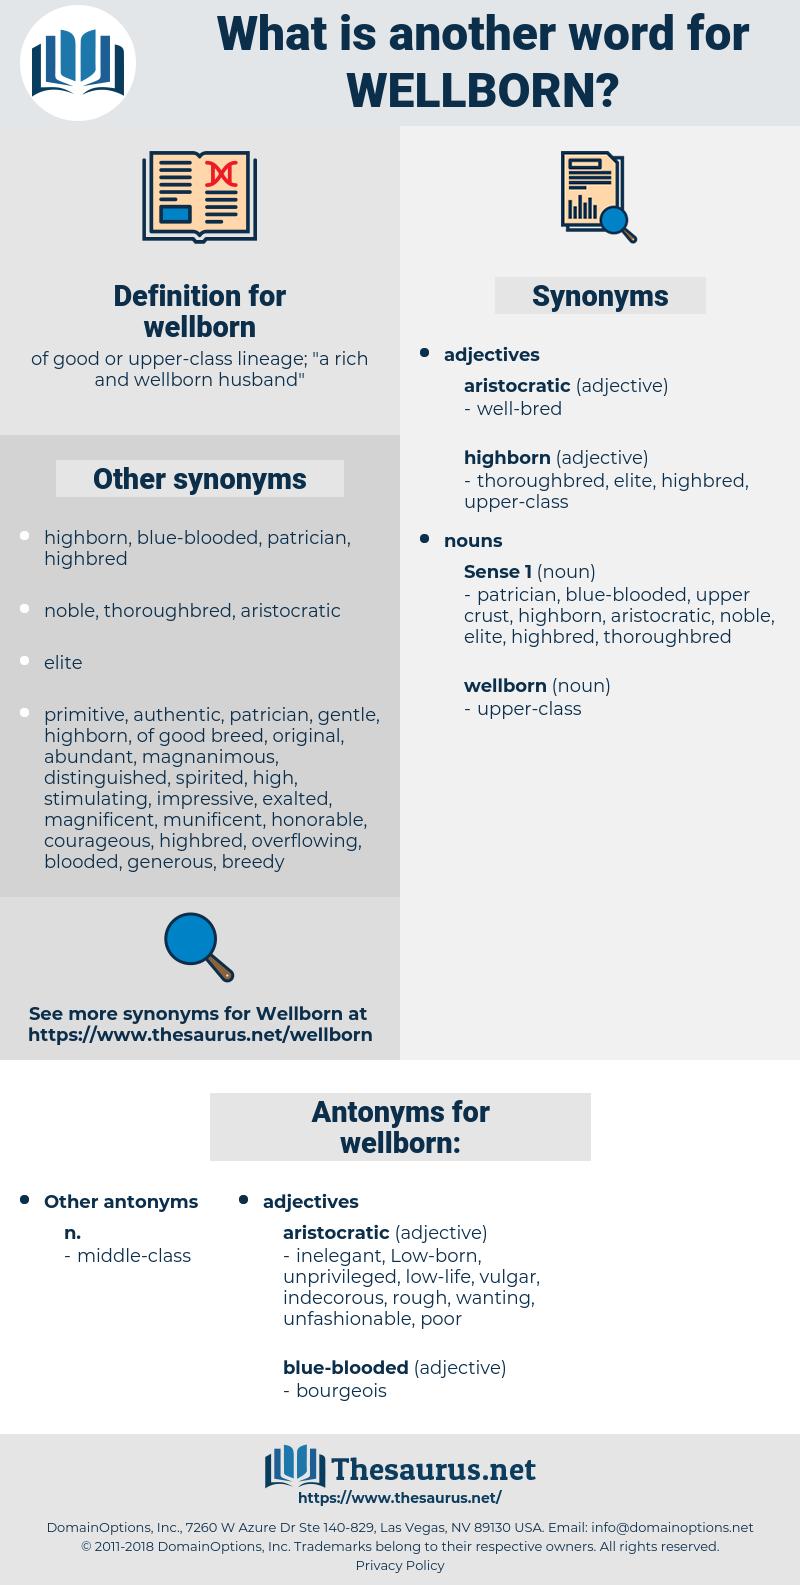 wellborn, synonym wellborn, another word for wellborn, words like wellborn, thesaurus wellborn